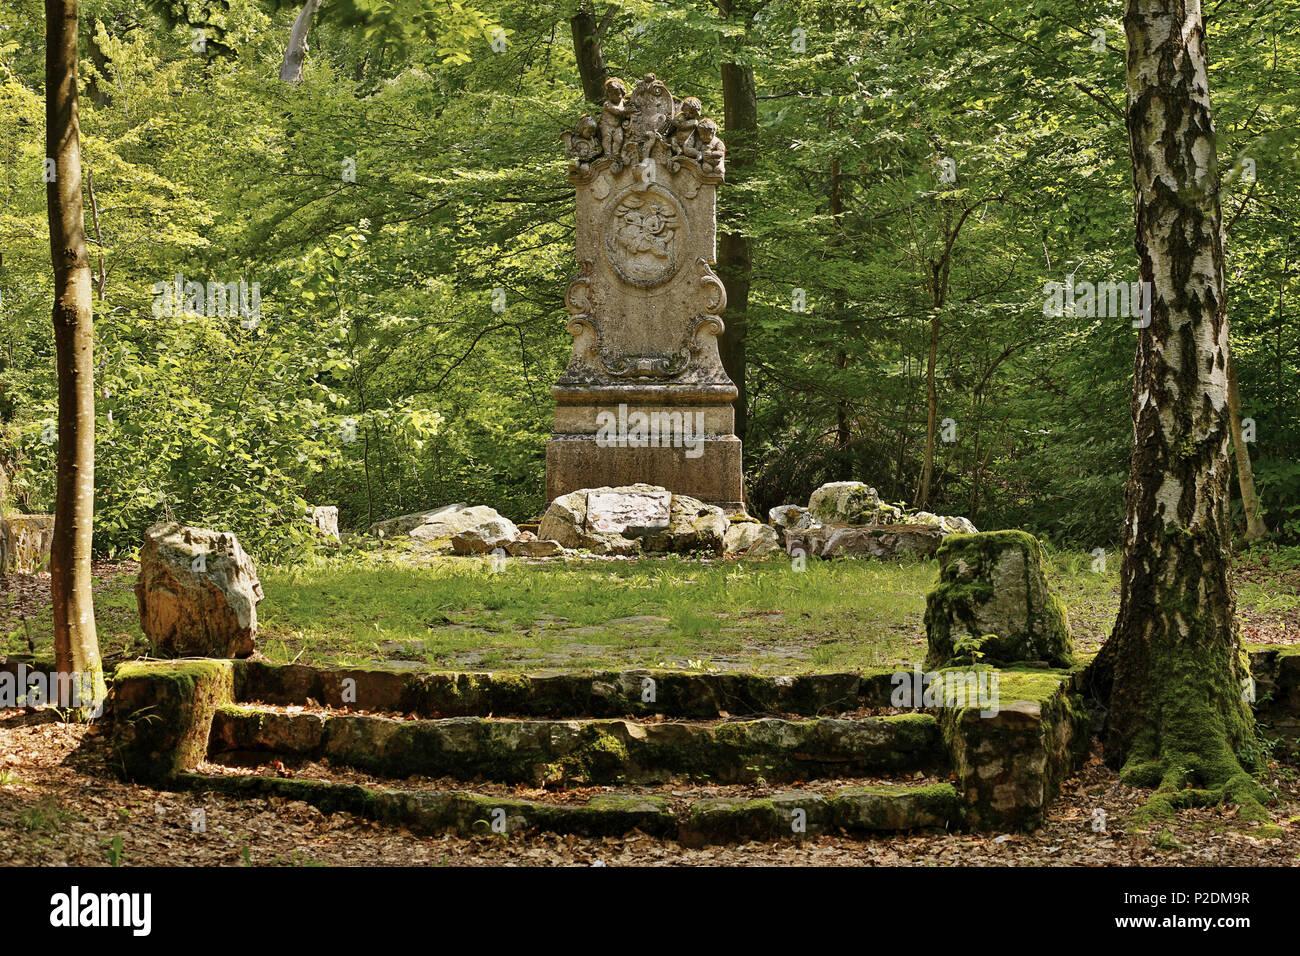 Memorial for hunters aus Kurpfalz in Entenpfuhl, Soonwald, Administrative district of Bad Kreuznach, Region of Nahe-Hunsrueck, R - Stock Image